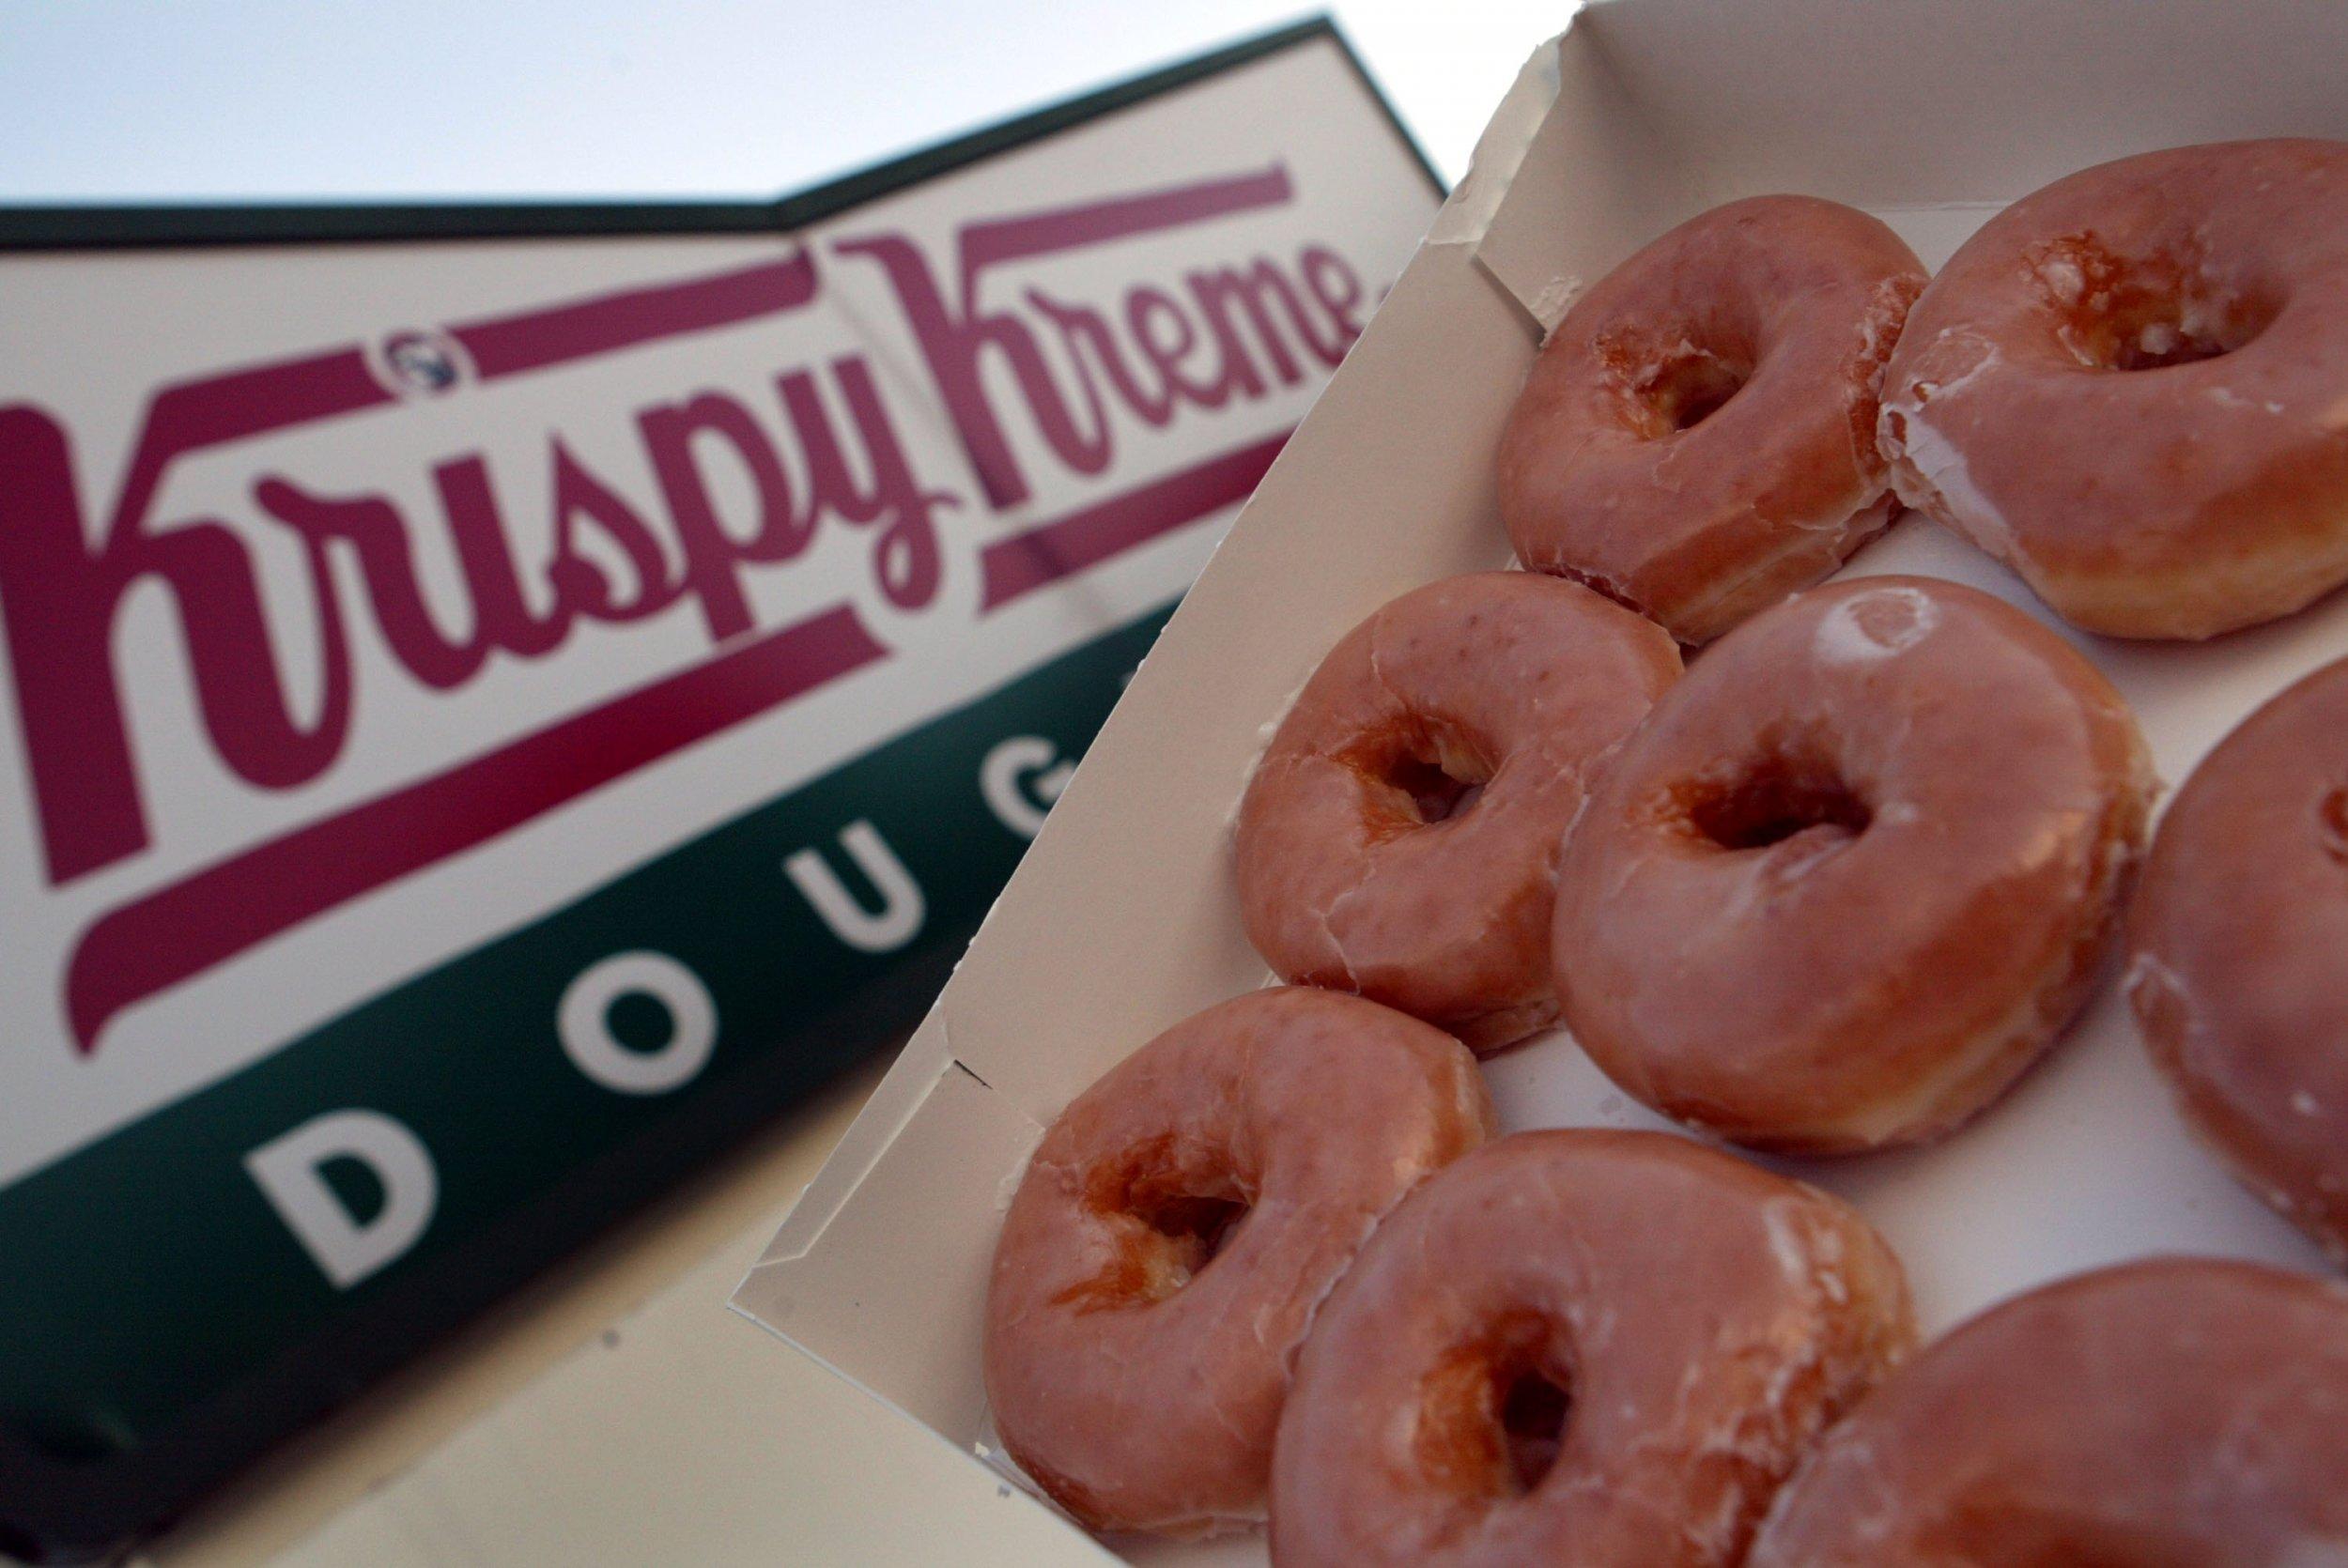 how long would you line up for a doughnut krispy kreme sale causes stalled traffic and three hour waits - Krispy Kreme Christmas Hours